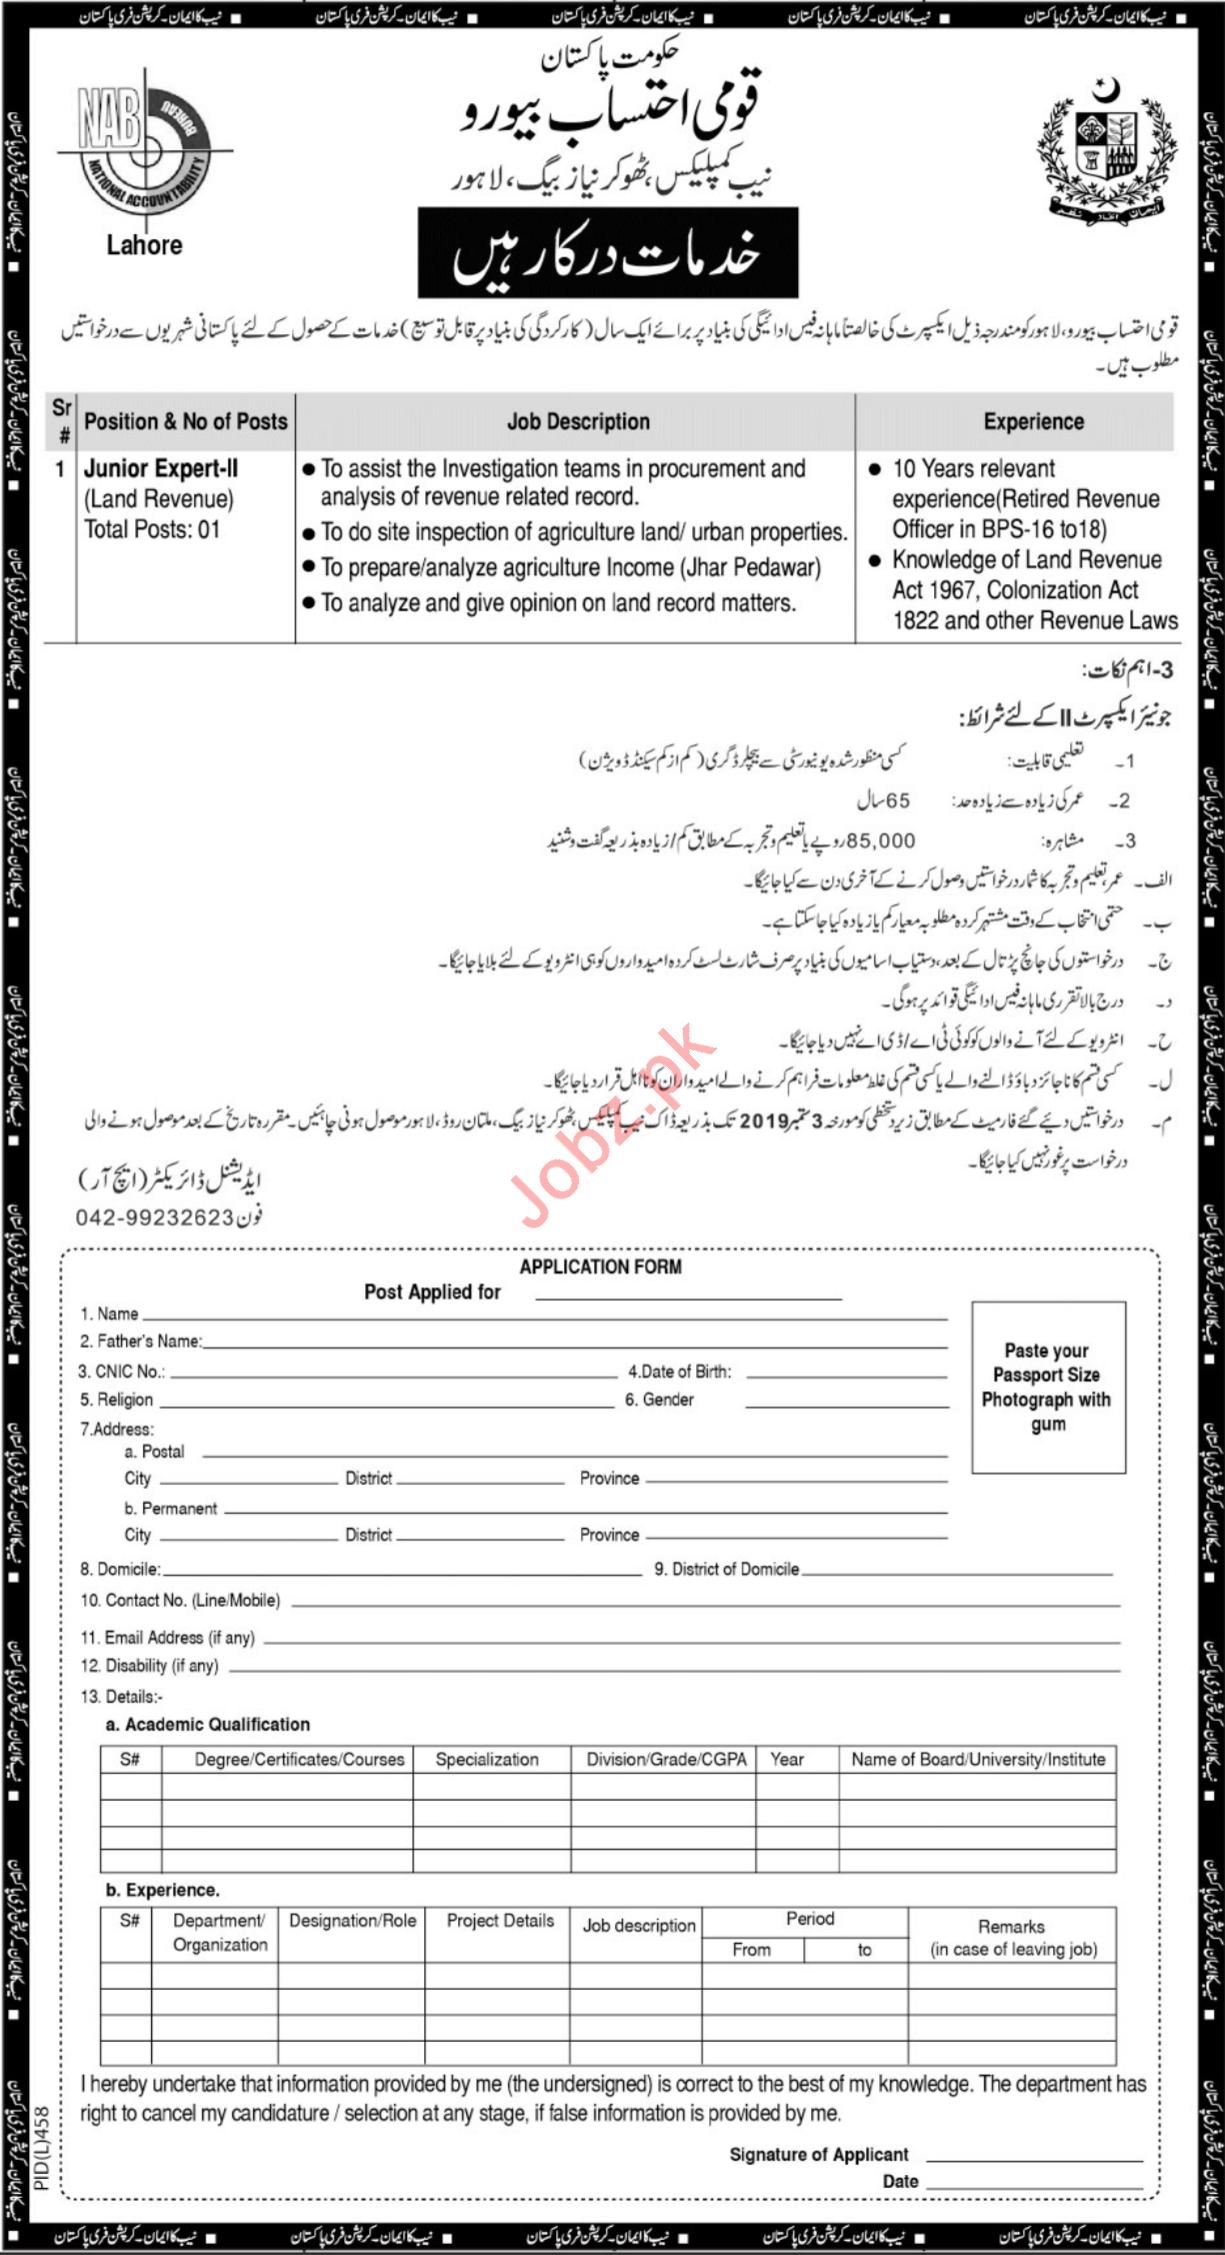 National Accountability Bureau NAB Jobs in Lahore